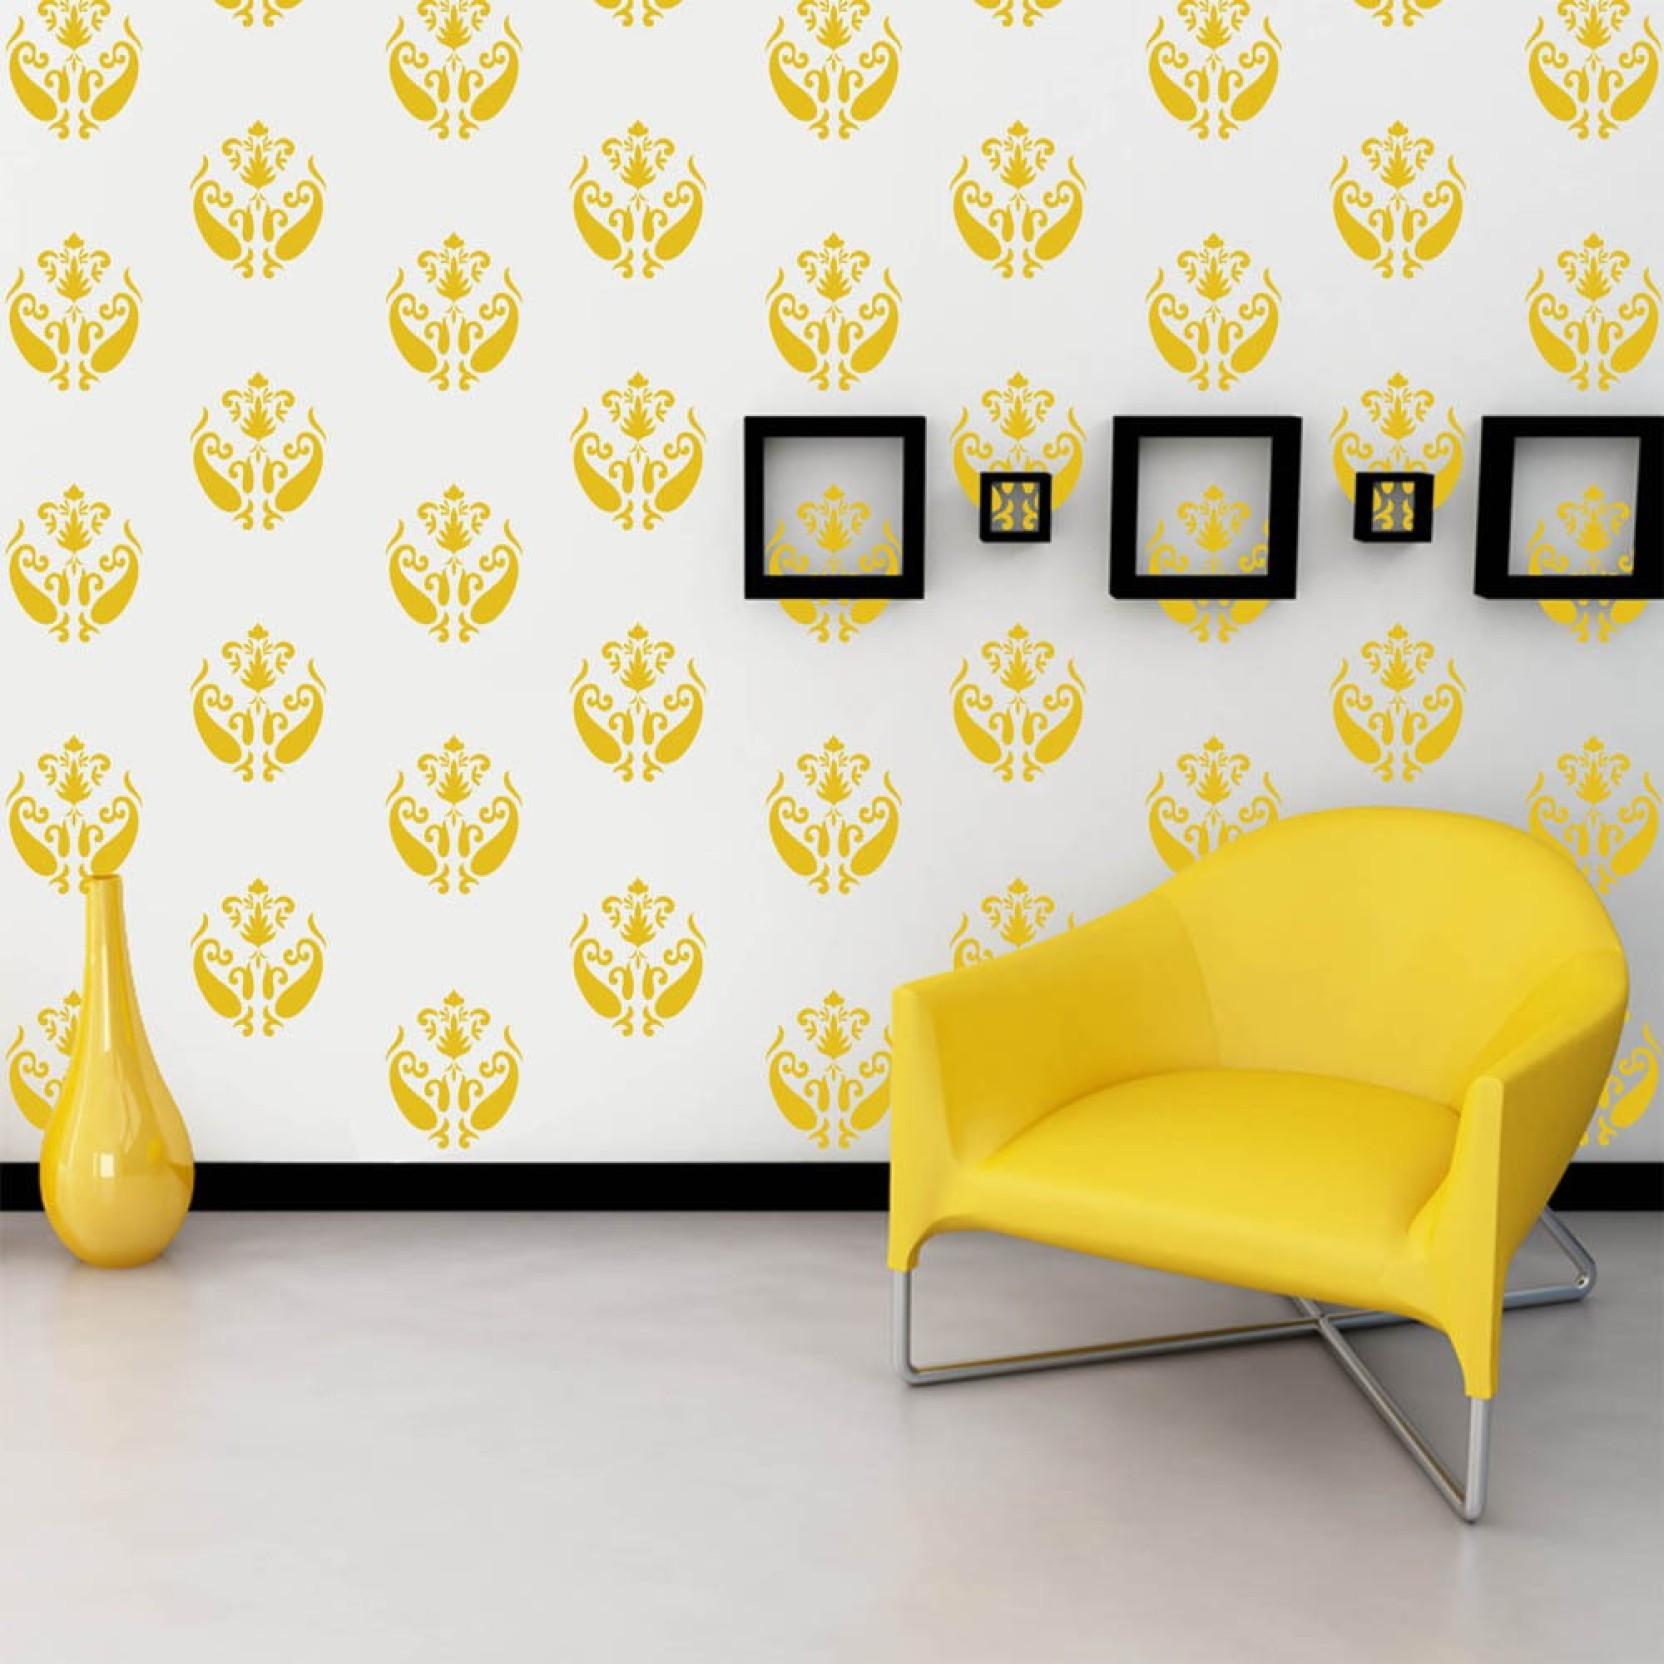 Arhat Stencils DAMASK ASR-E183 GLOSSY PVC (Wall Décor & Art) Stencil ...